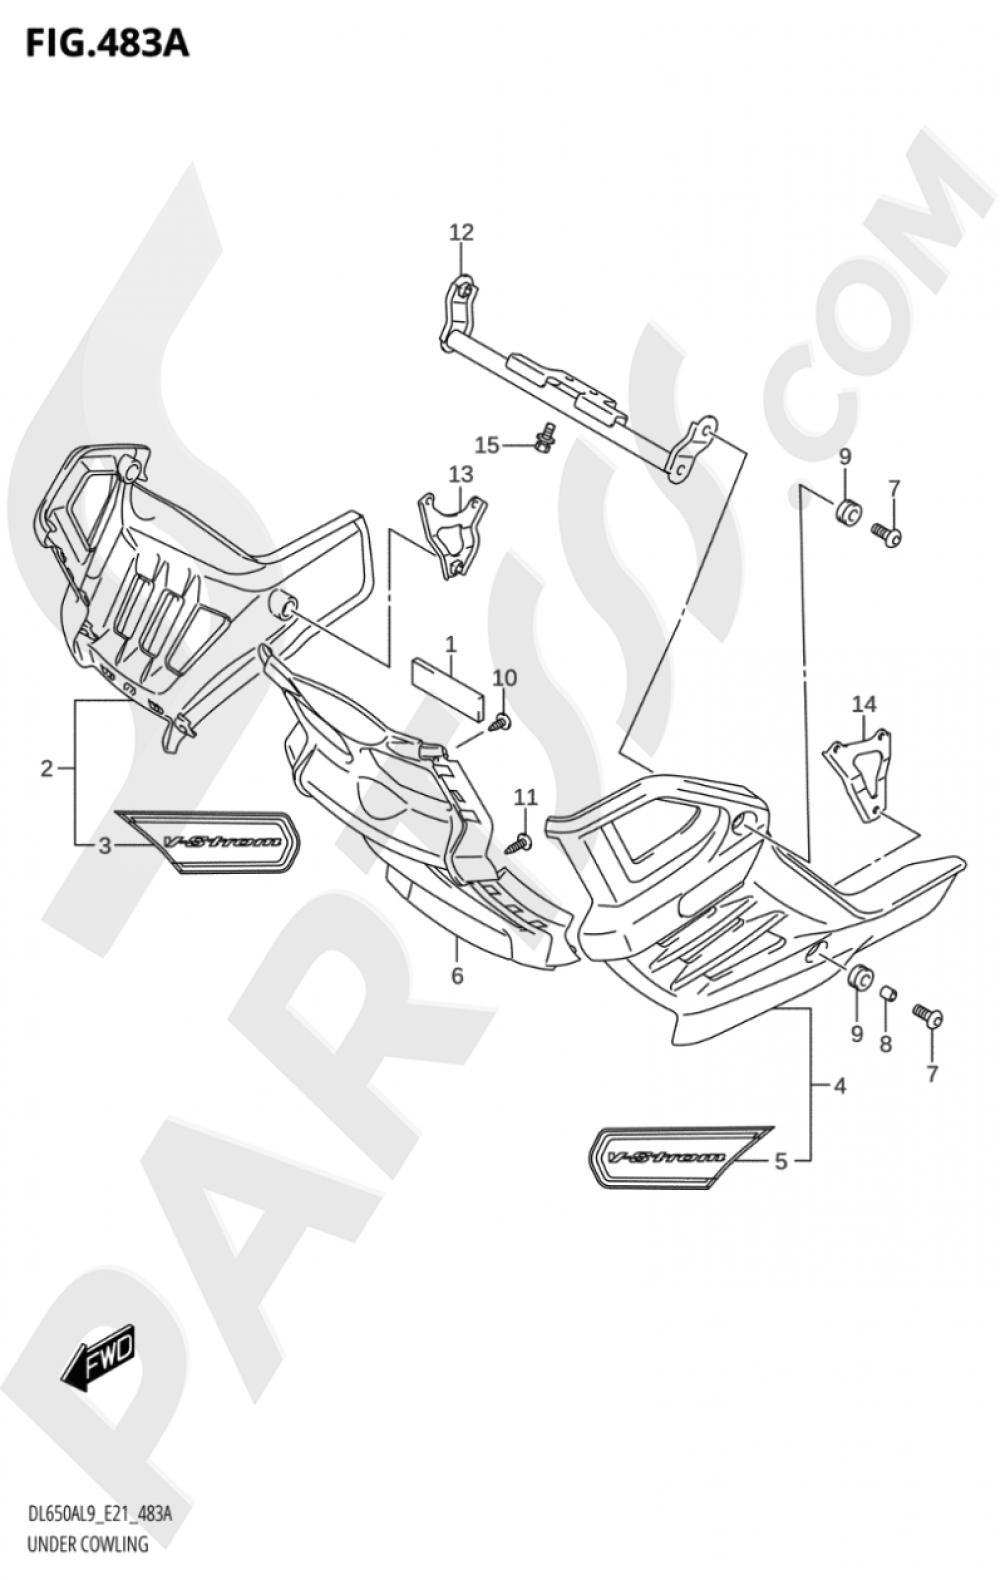 483A - UNDER COWLING (DL650XA,DL650XAUE) Suzuki VSTROM DL650A 2019